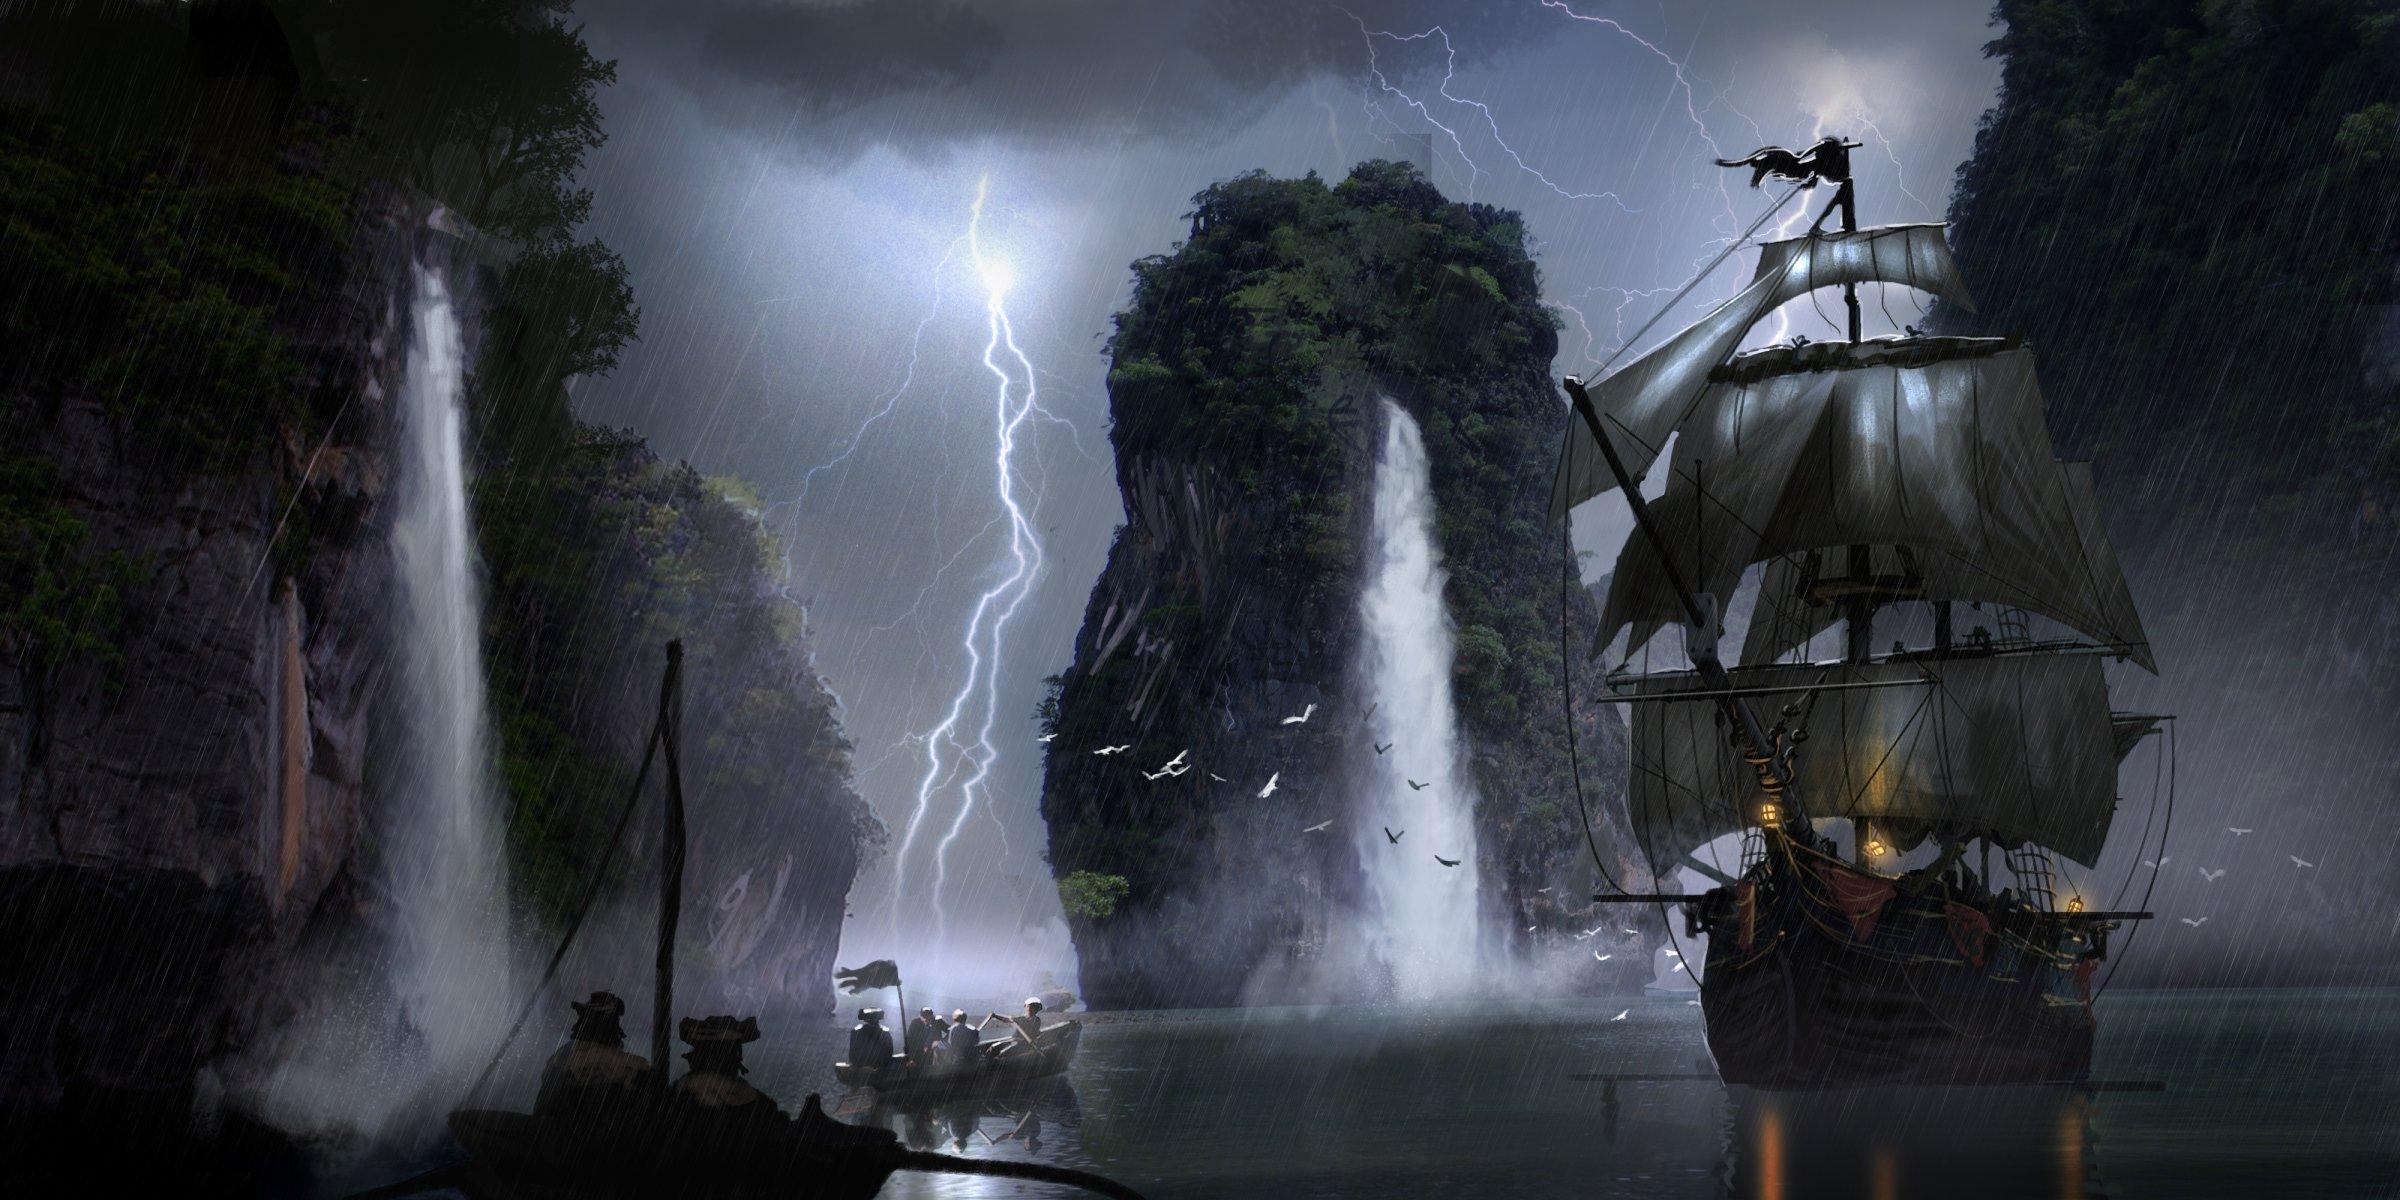 пиратские корабли фото картинки фэнтези него, любой наряд